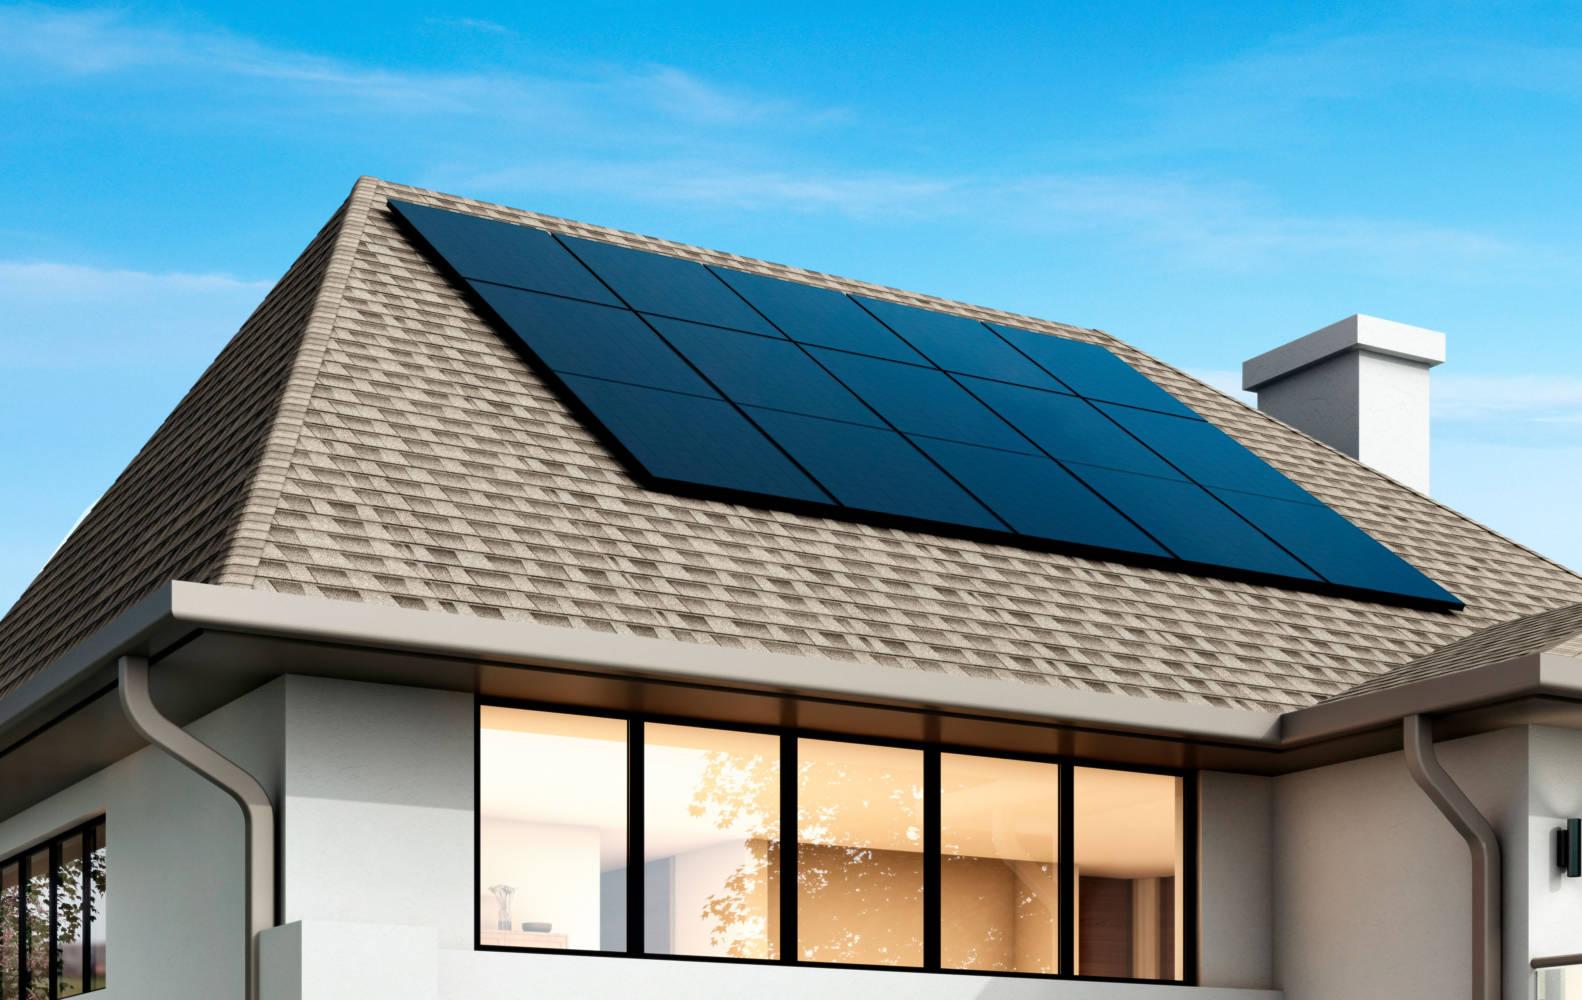 Ireland Launches New Seai Solar Grant Scheme For